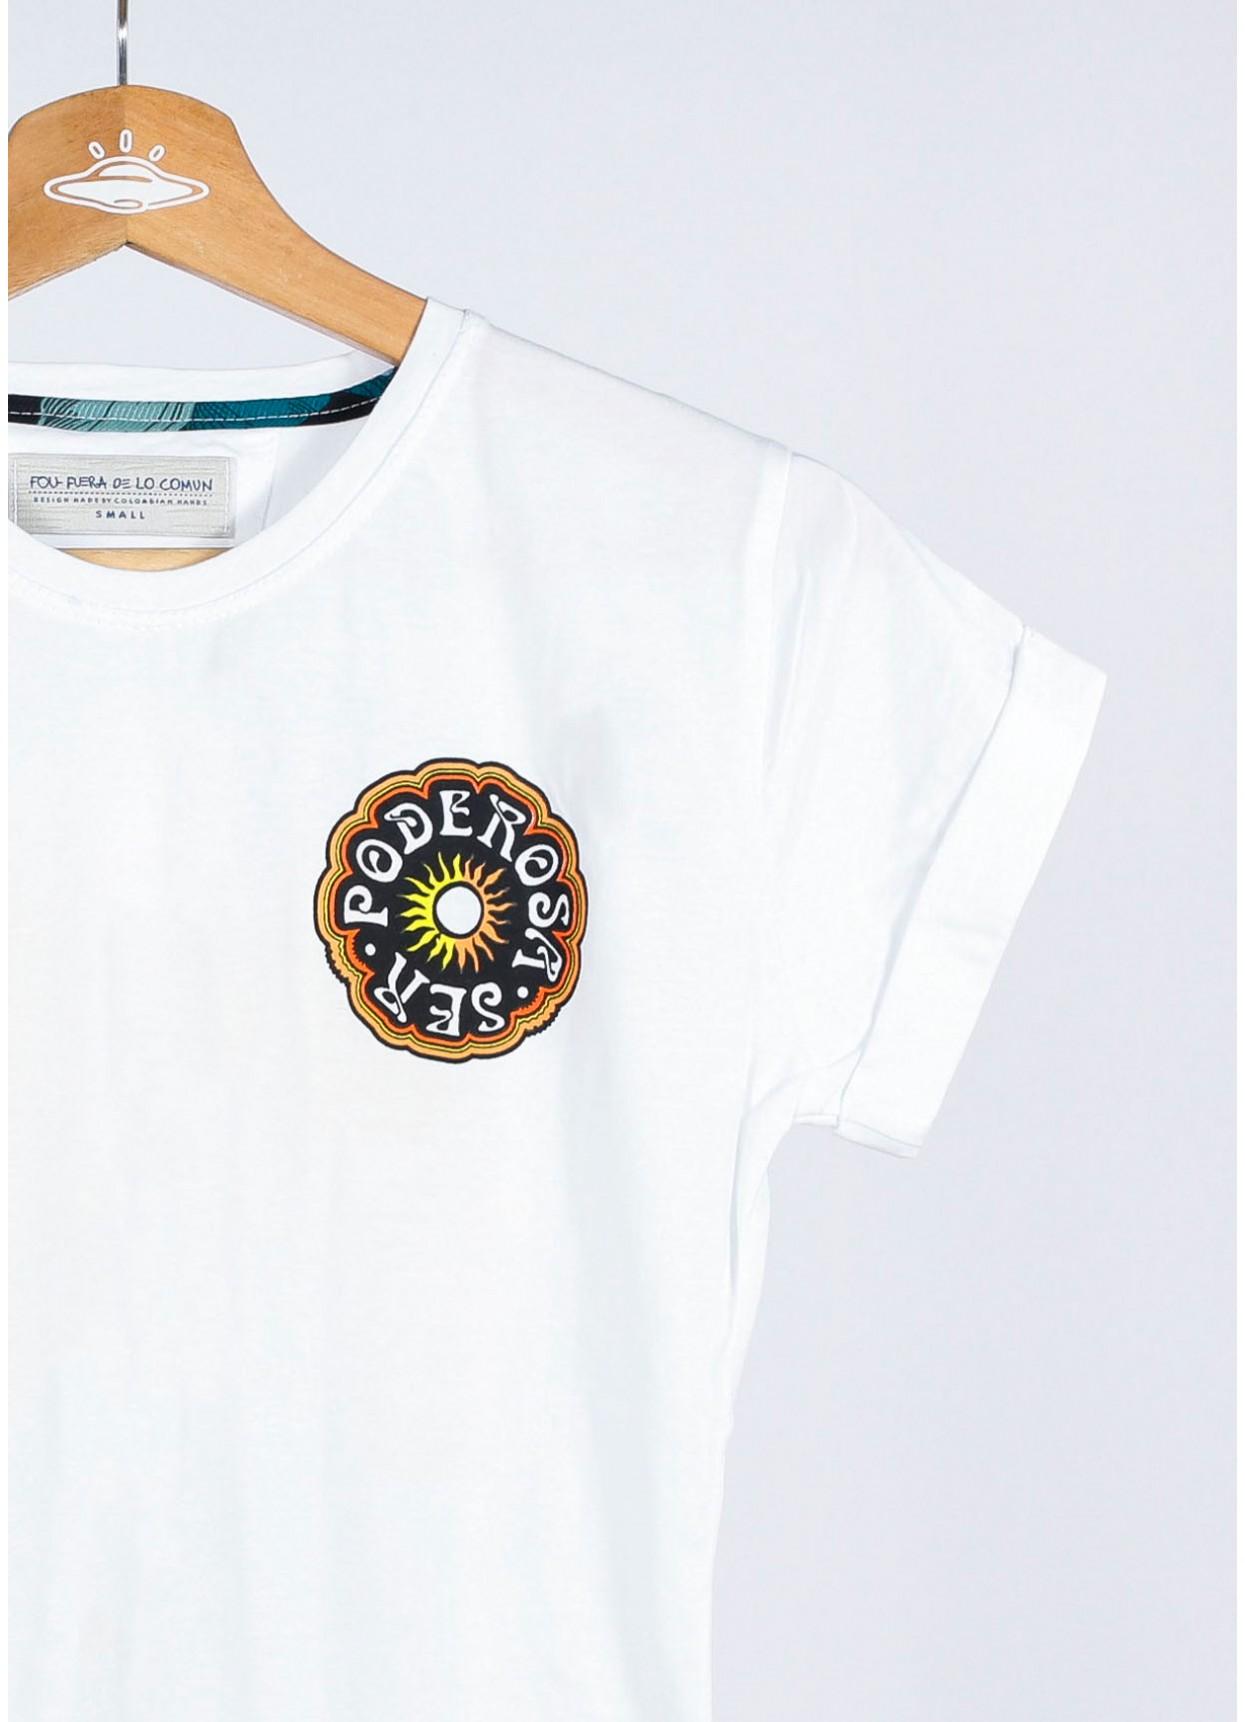 Camiseta Ser Poderosa para mujer